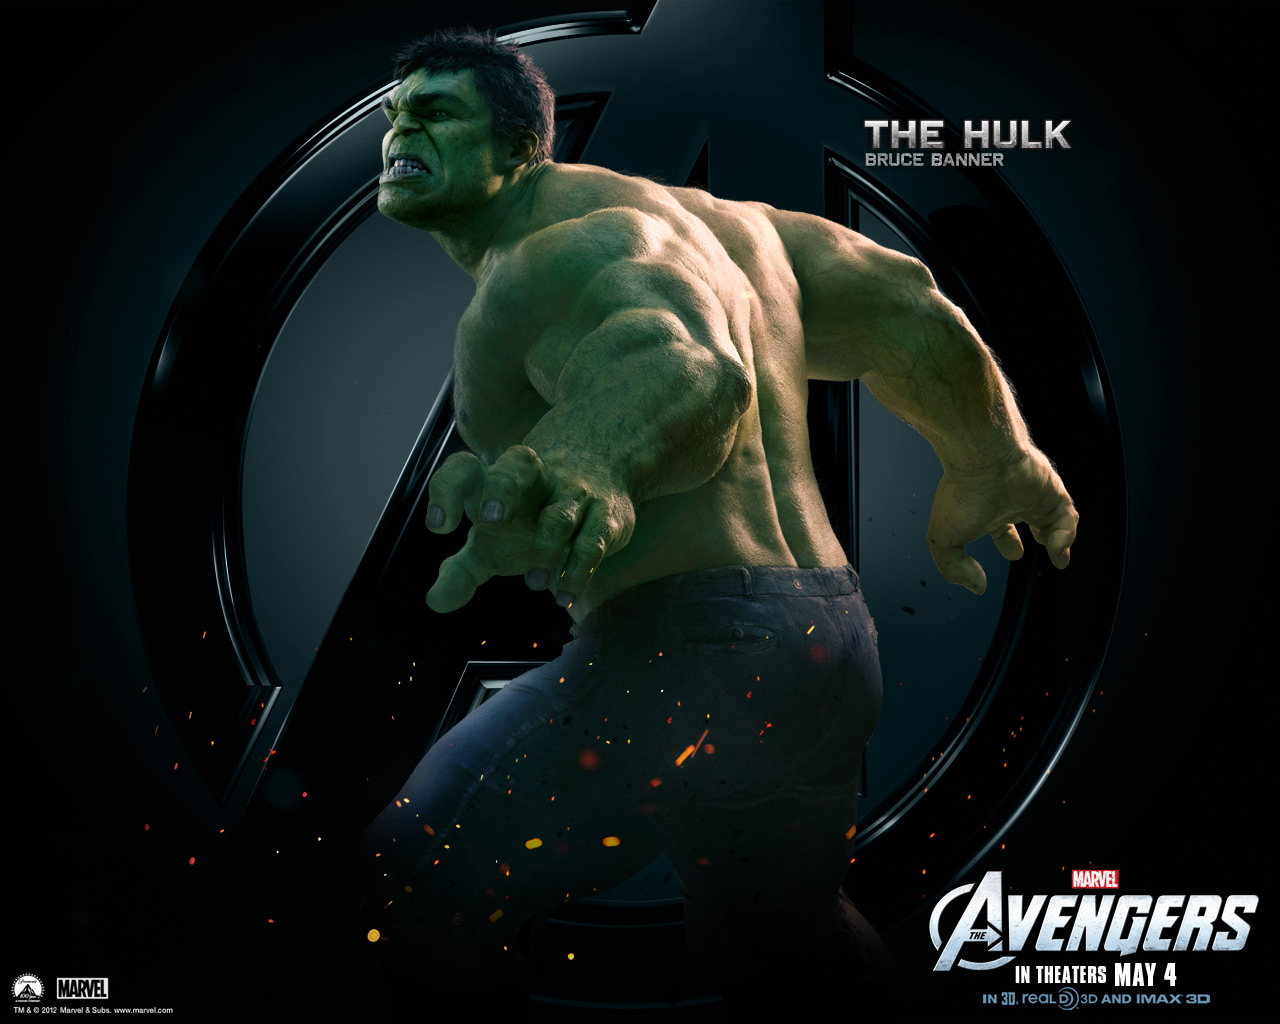 http://1.bp.blogspot.com/-tsGVYB2r6Es/T8bOhwVjhNI/AAAAAAAABAk/W1YpeISS_jM/s1600/The+Avengers+-+Movie+Hulk.jpg